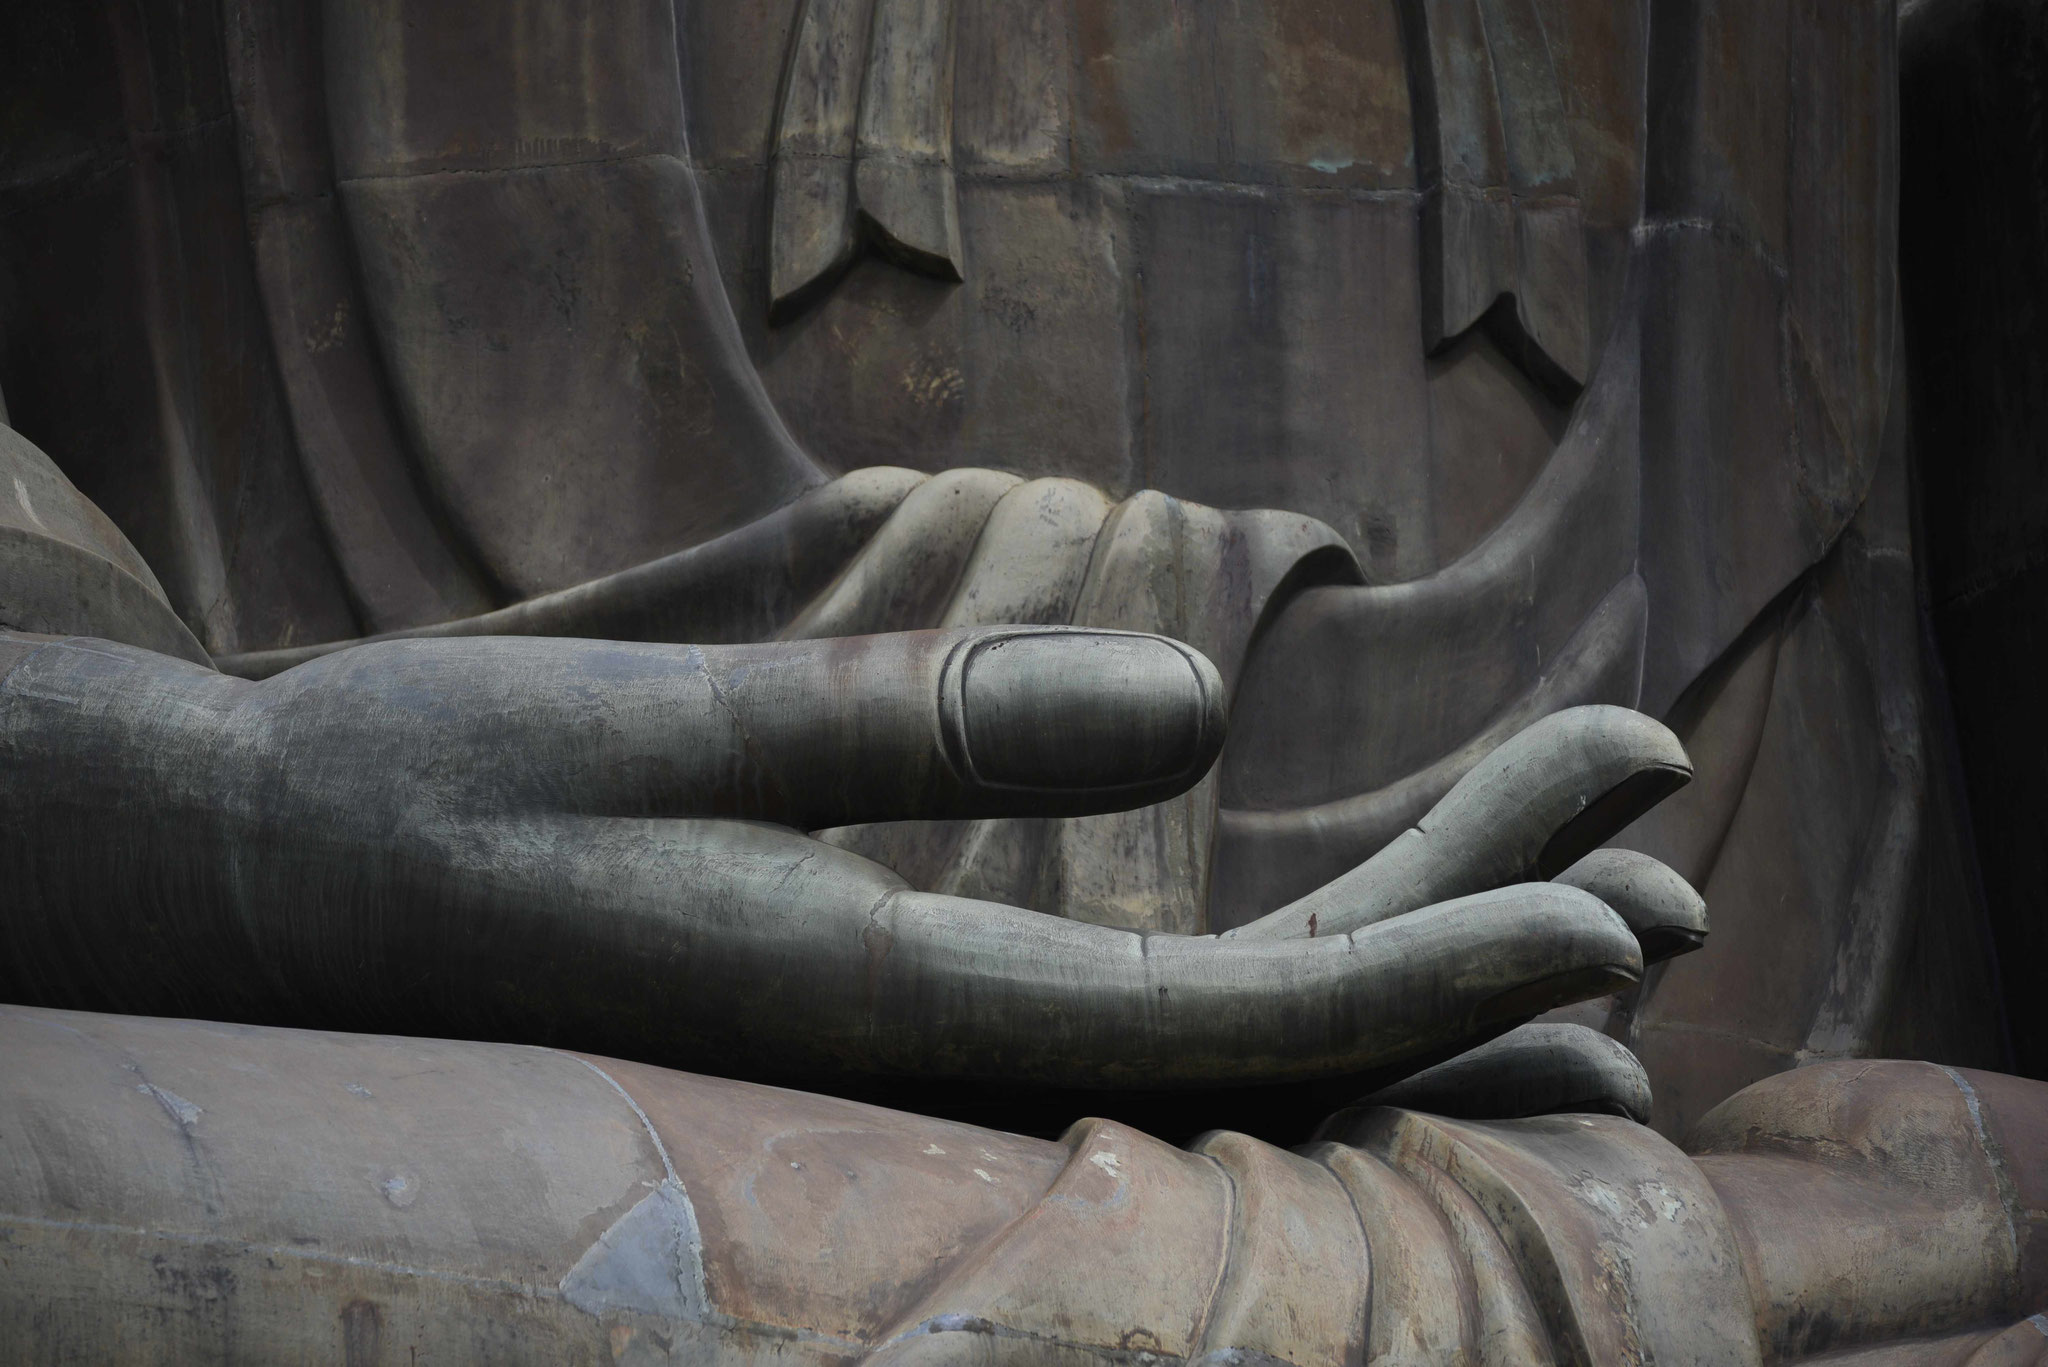 Übergroße, gütige Hand